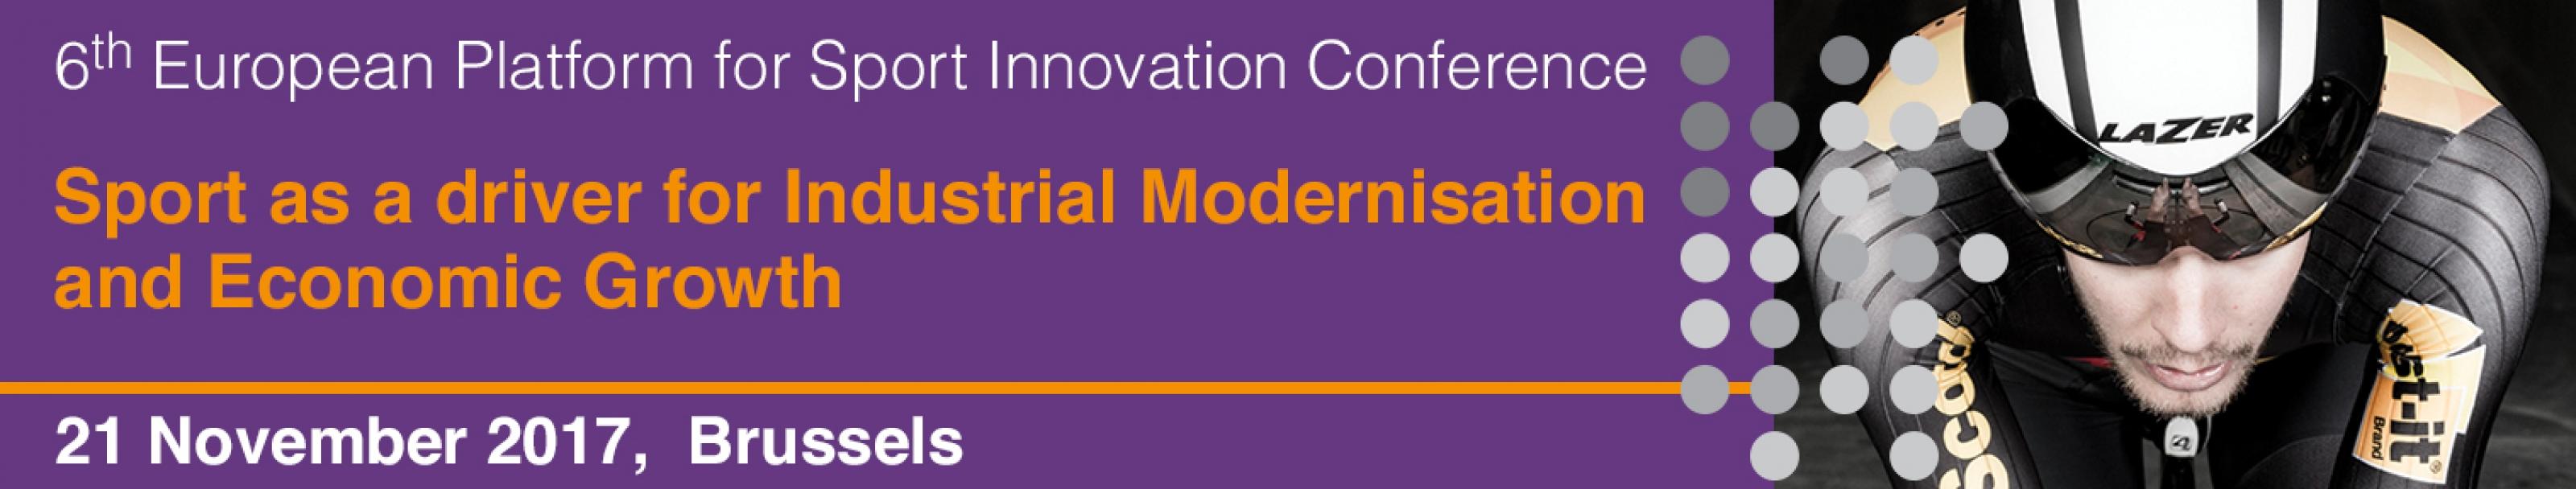 EPSI-conference-landscape